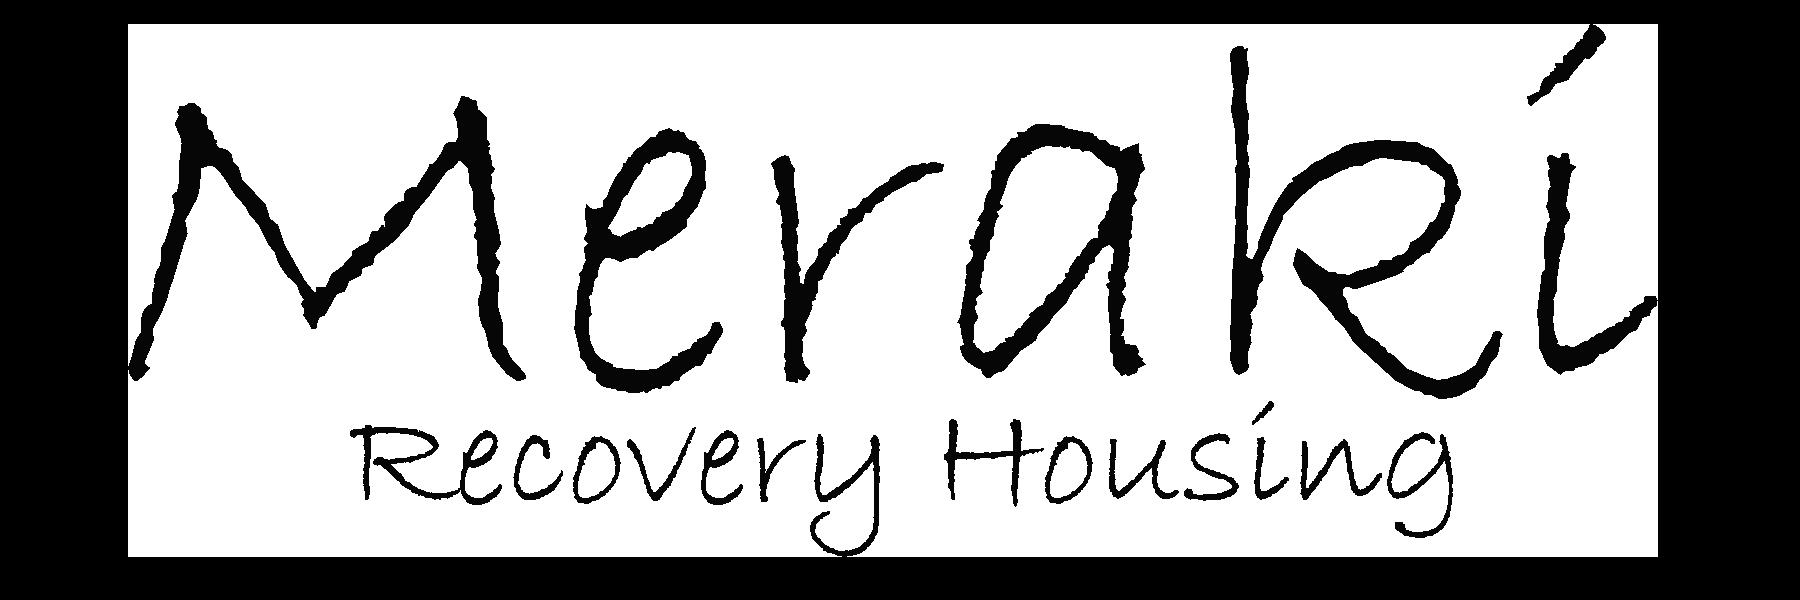 Meraki Recovery Housing